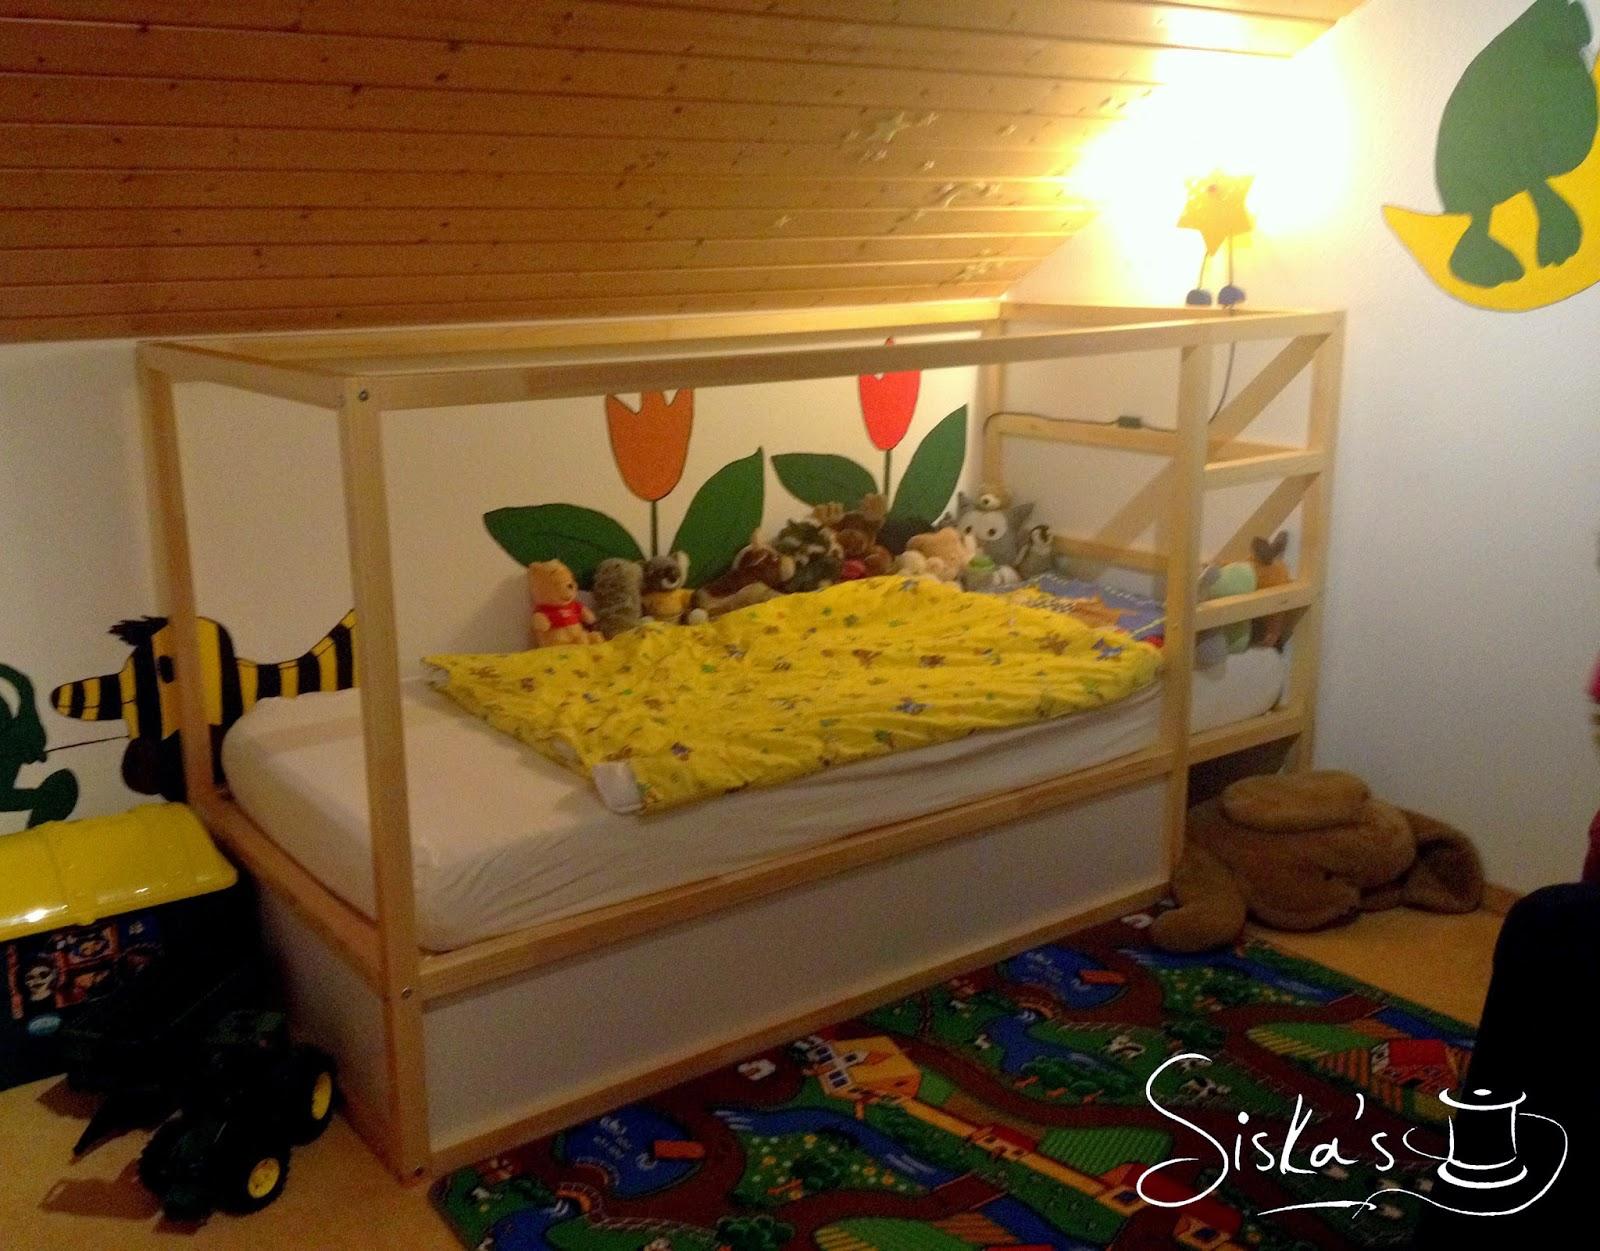 siska 39 s ikea hacker oder wie aus bett kura ein janosch haus wird. Black Bedroom Furniture Sets. Home Design Ideas